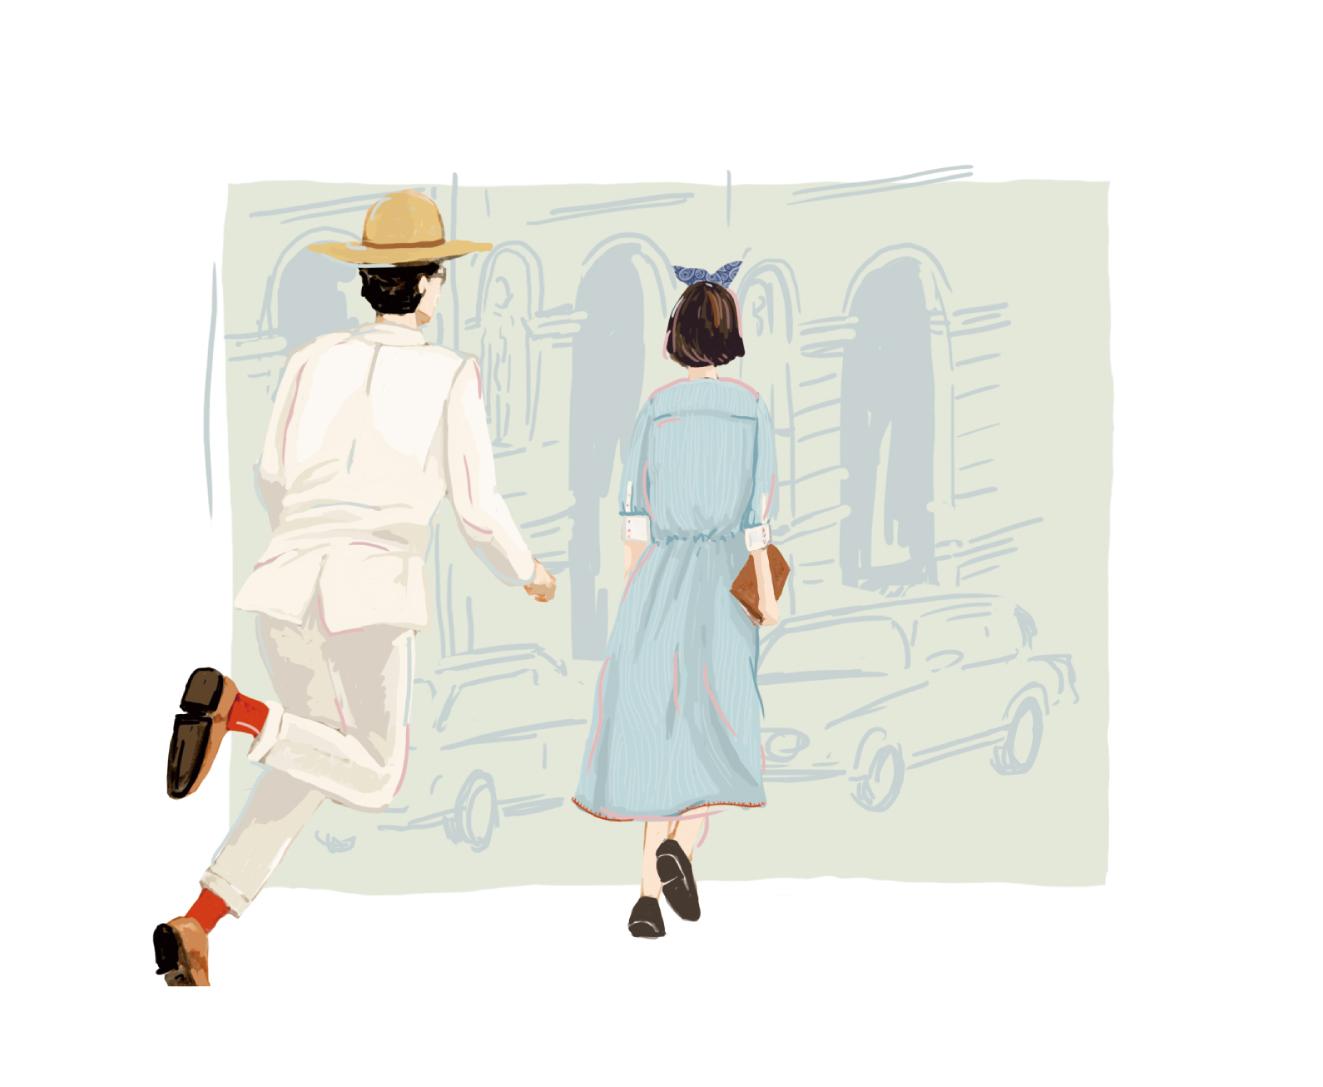 0731-SYNDRO-CARD-02